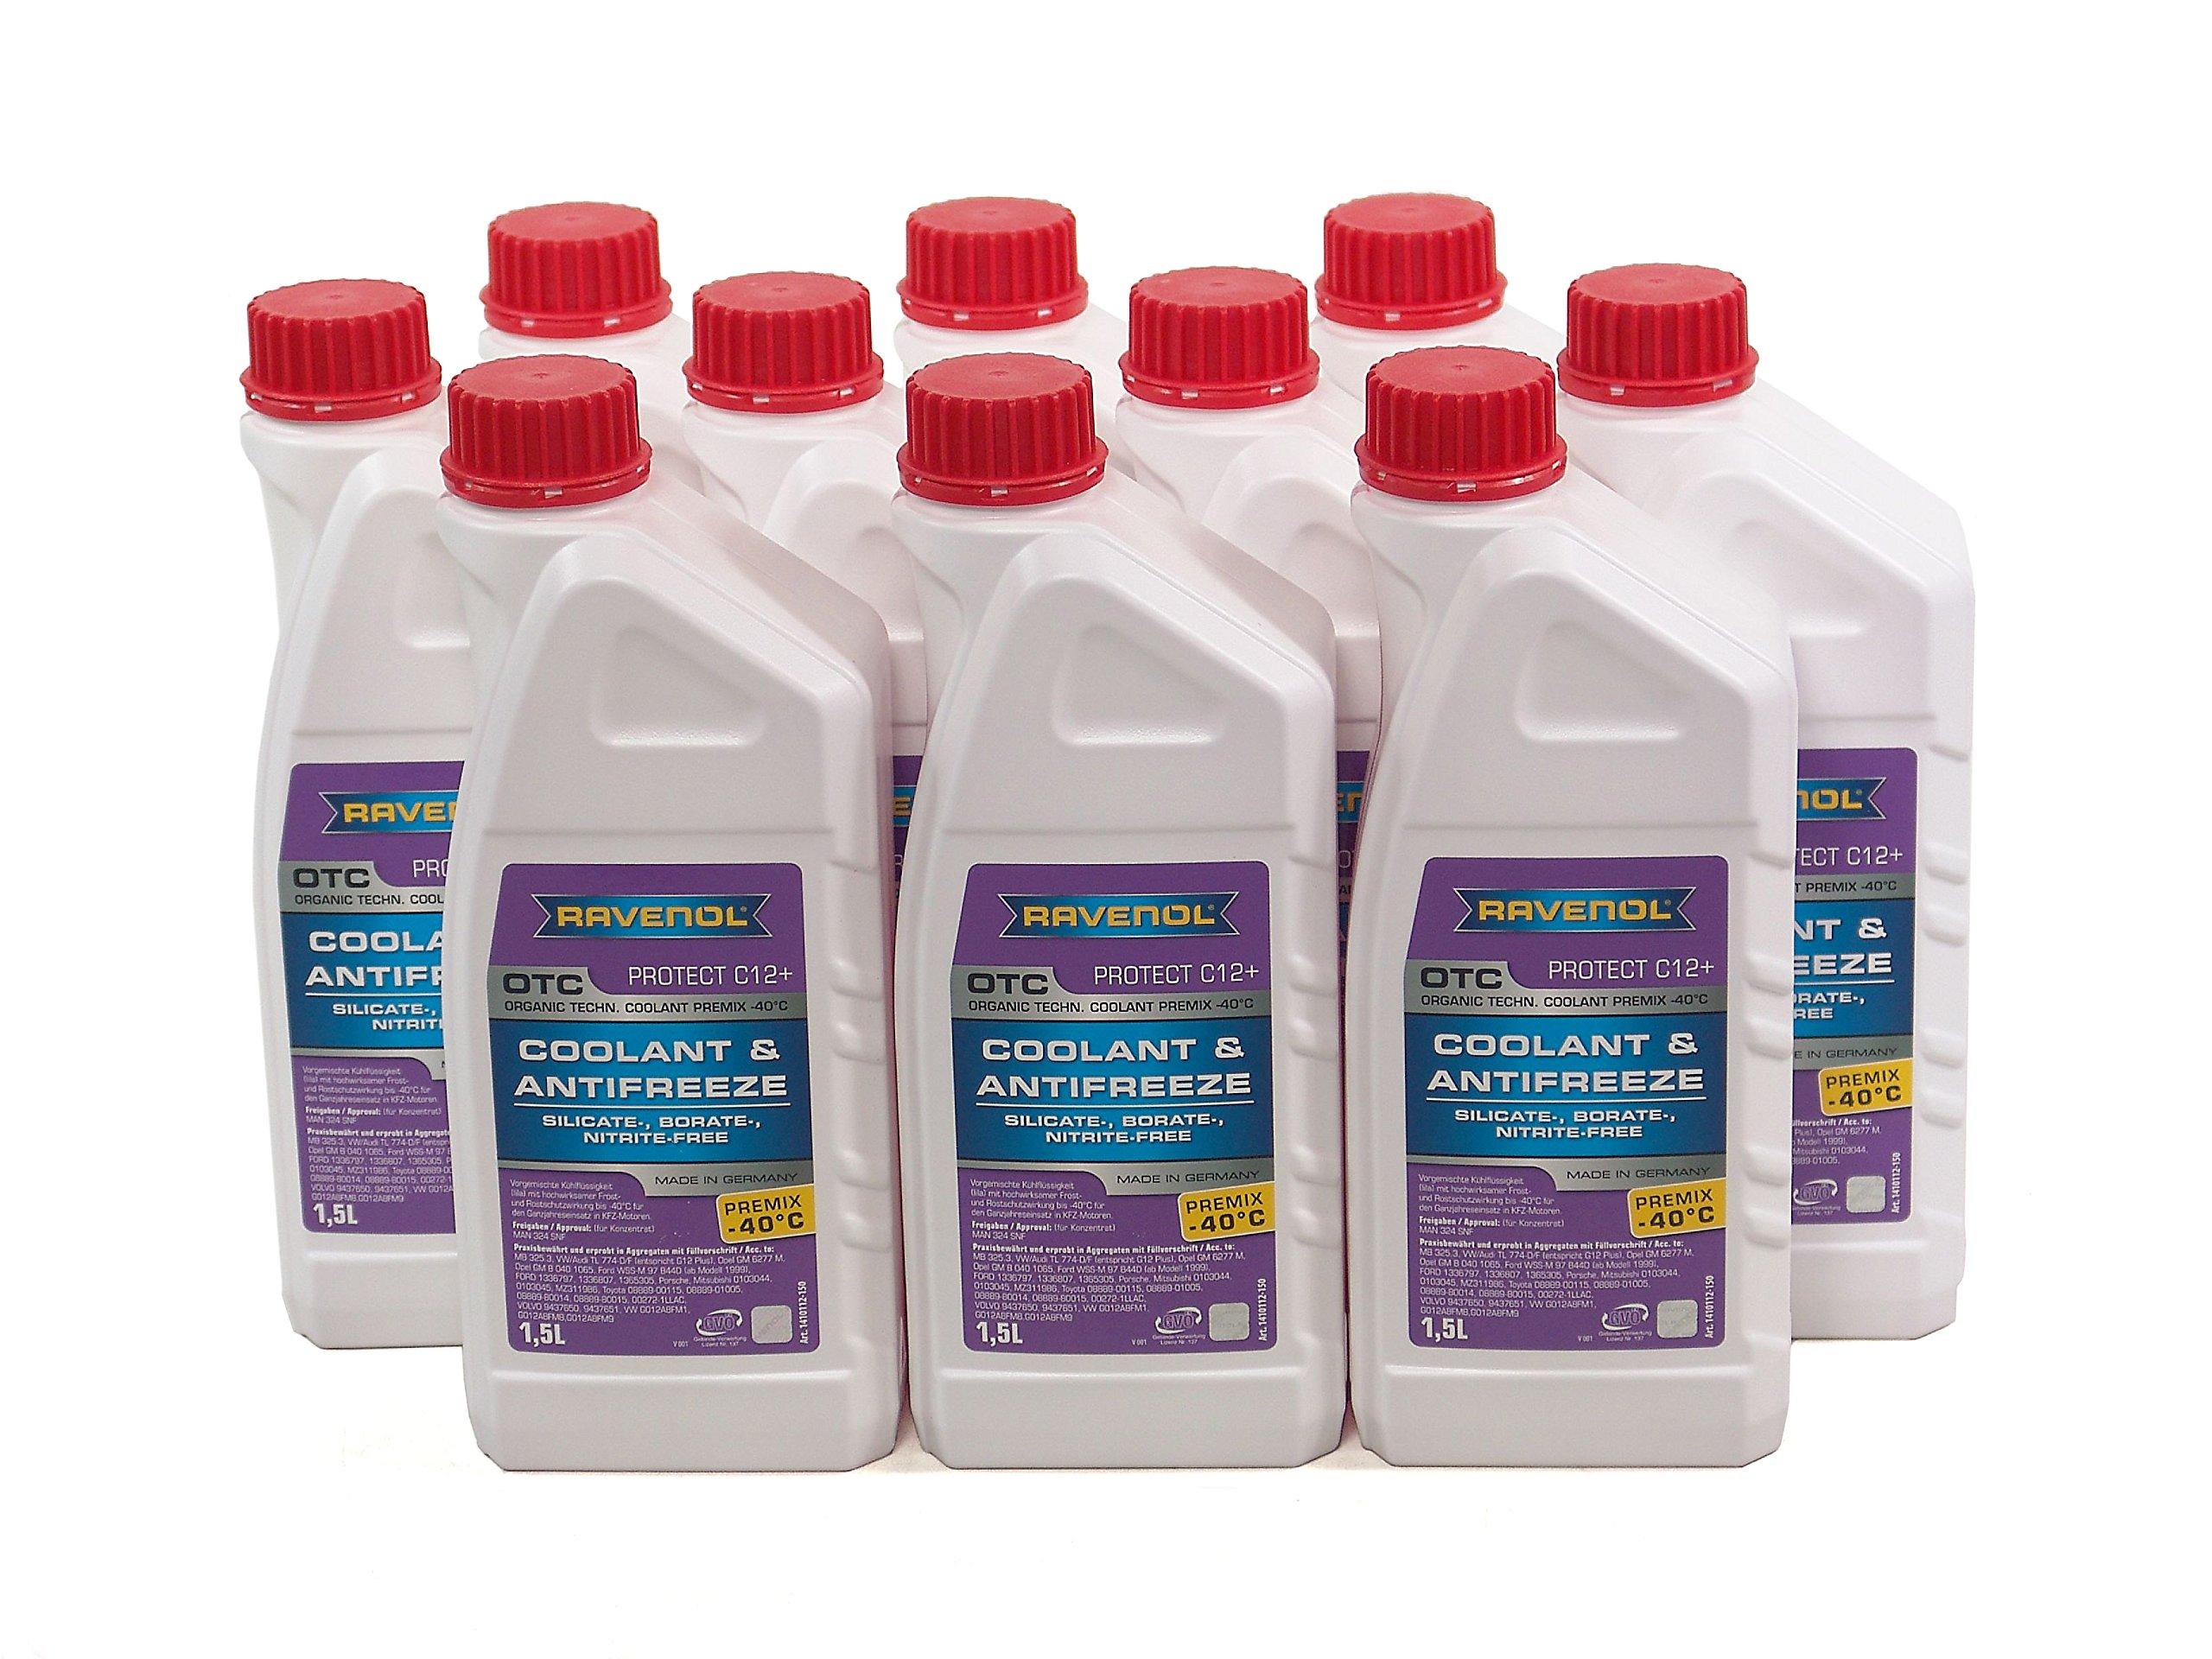 RAVENOL J4D2000-1-10 OTC C12+ Coolant Antifreeze Premix (G12 Plus) (1.5L, Case of 10)